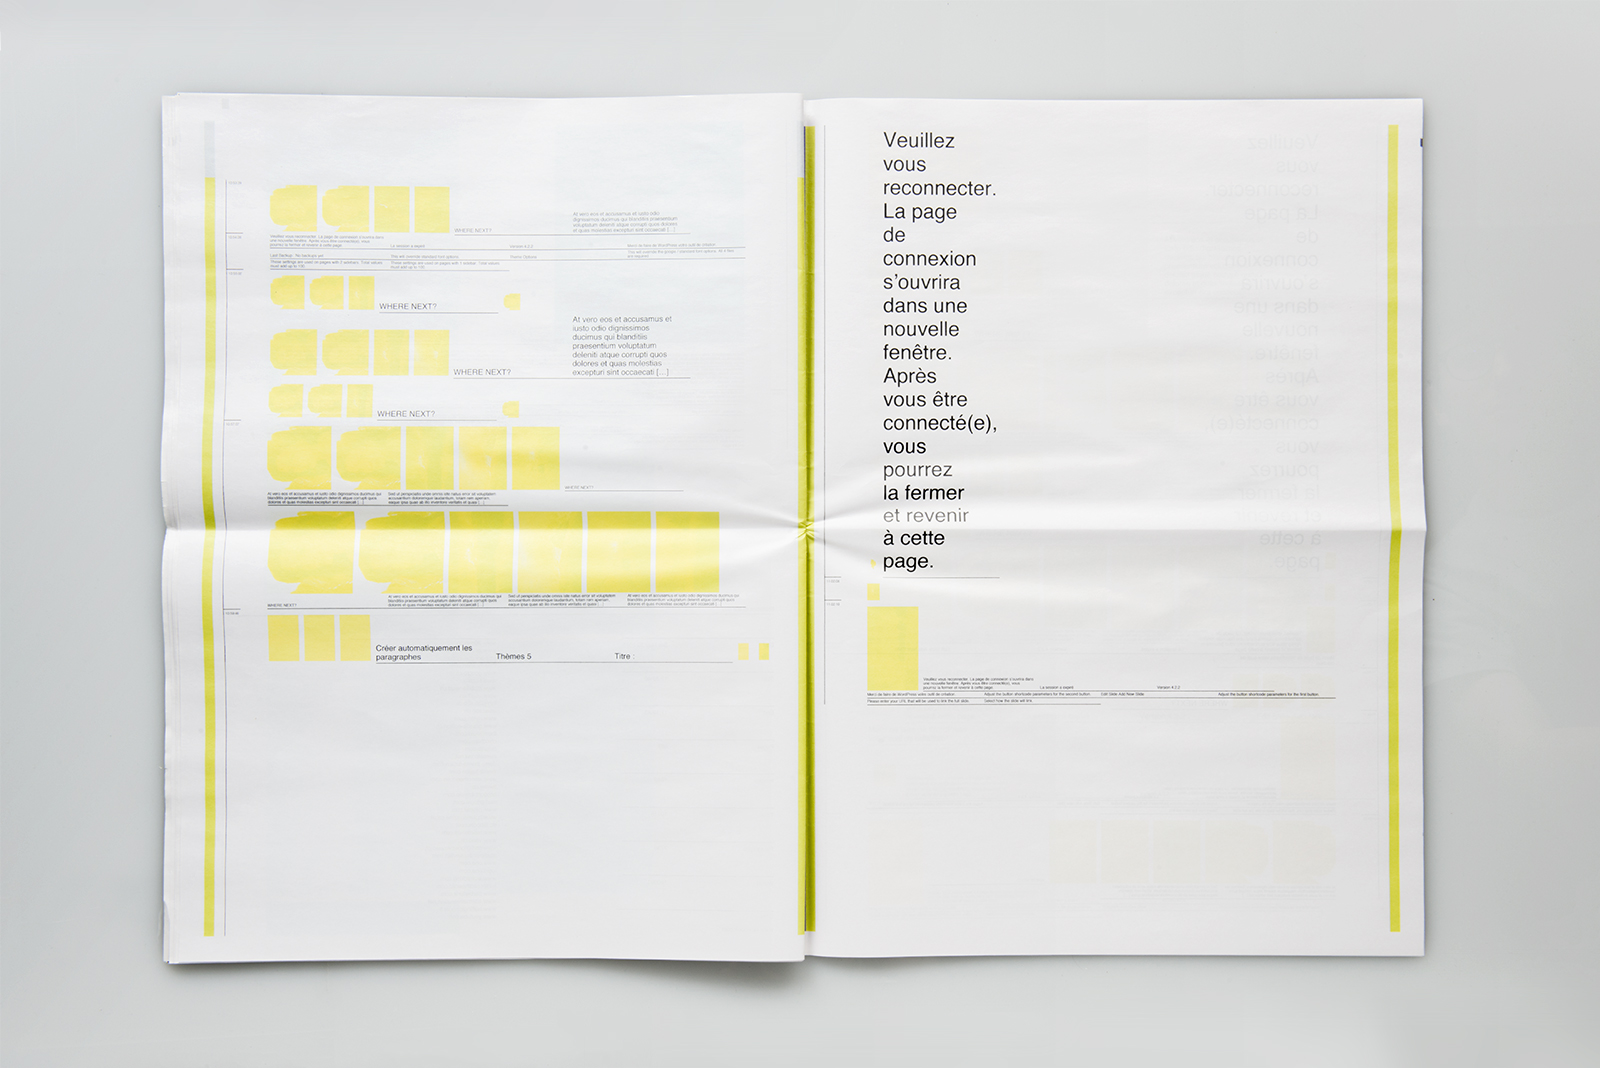 chrome extension print page to pdf